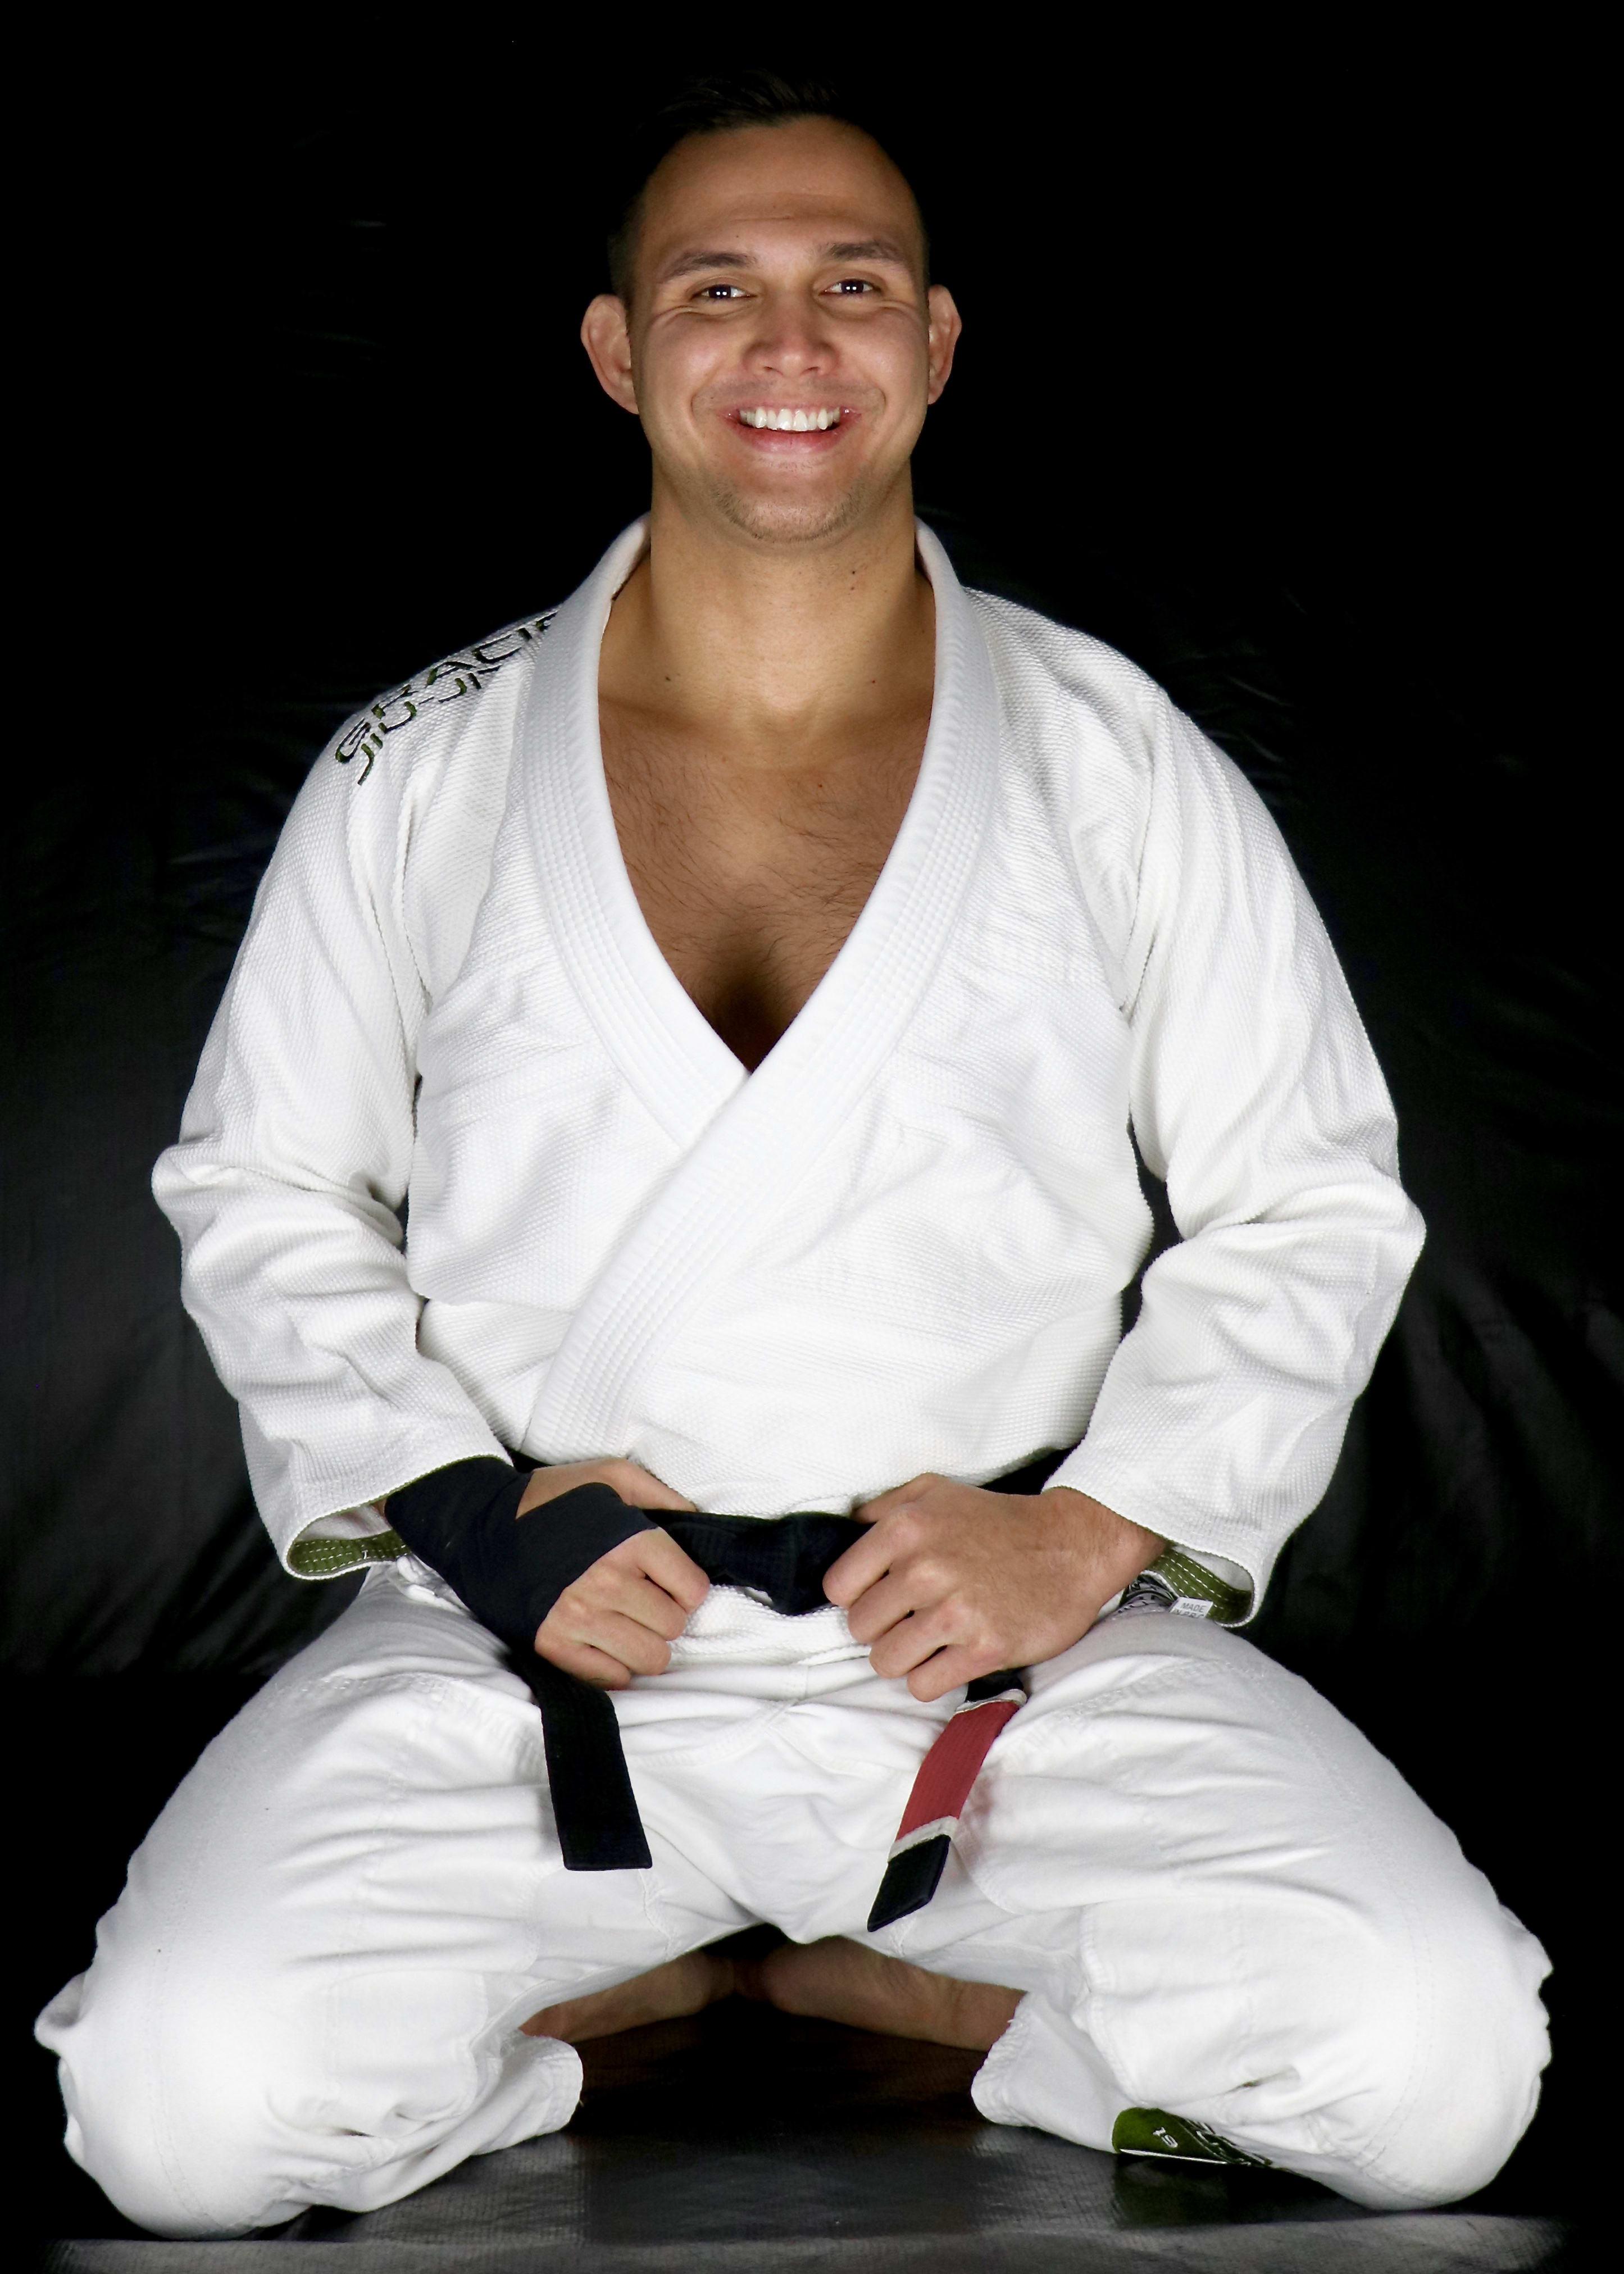 Shawn Coad in Denver - Dark Horse Combat Club